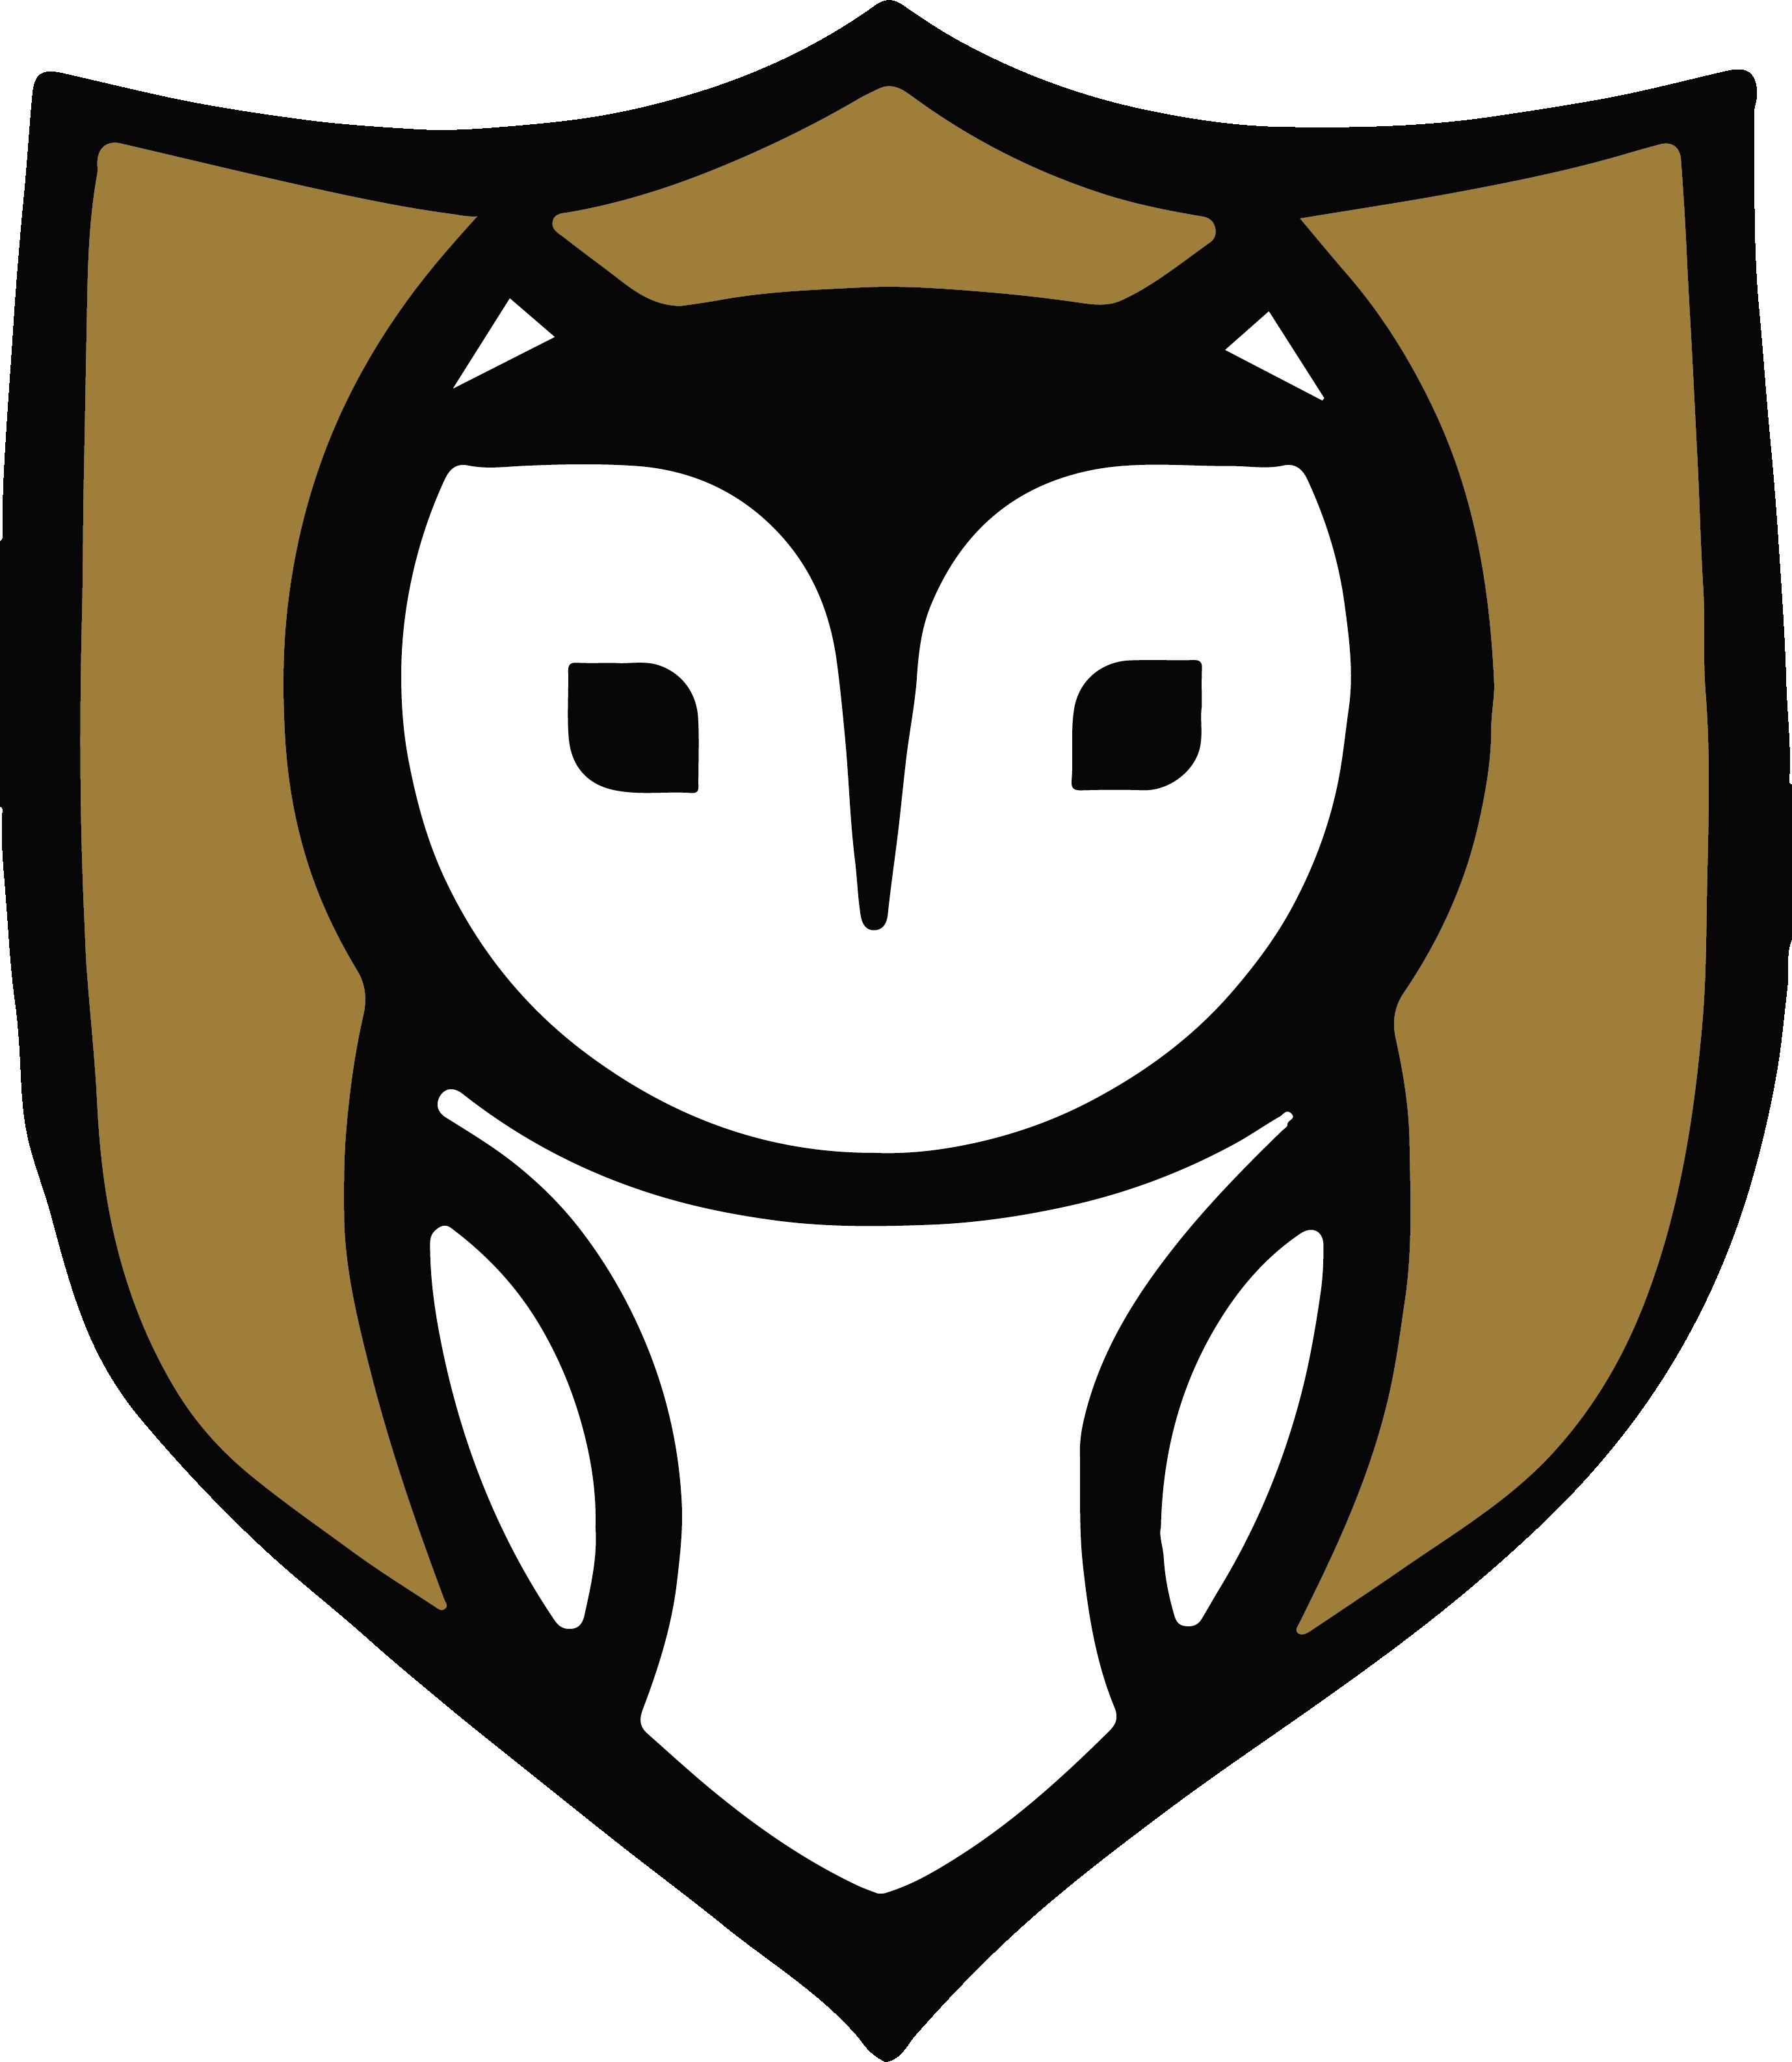 LAC owl logo